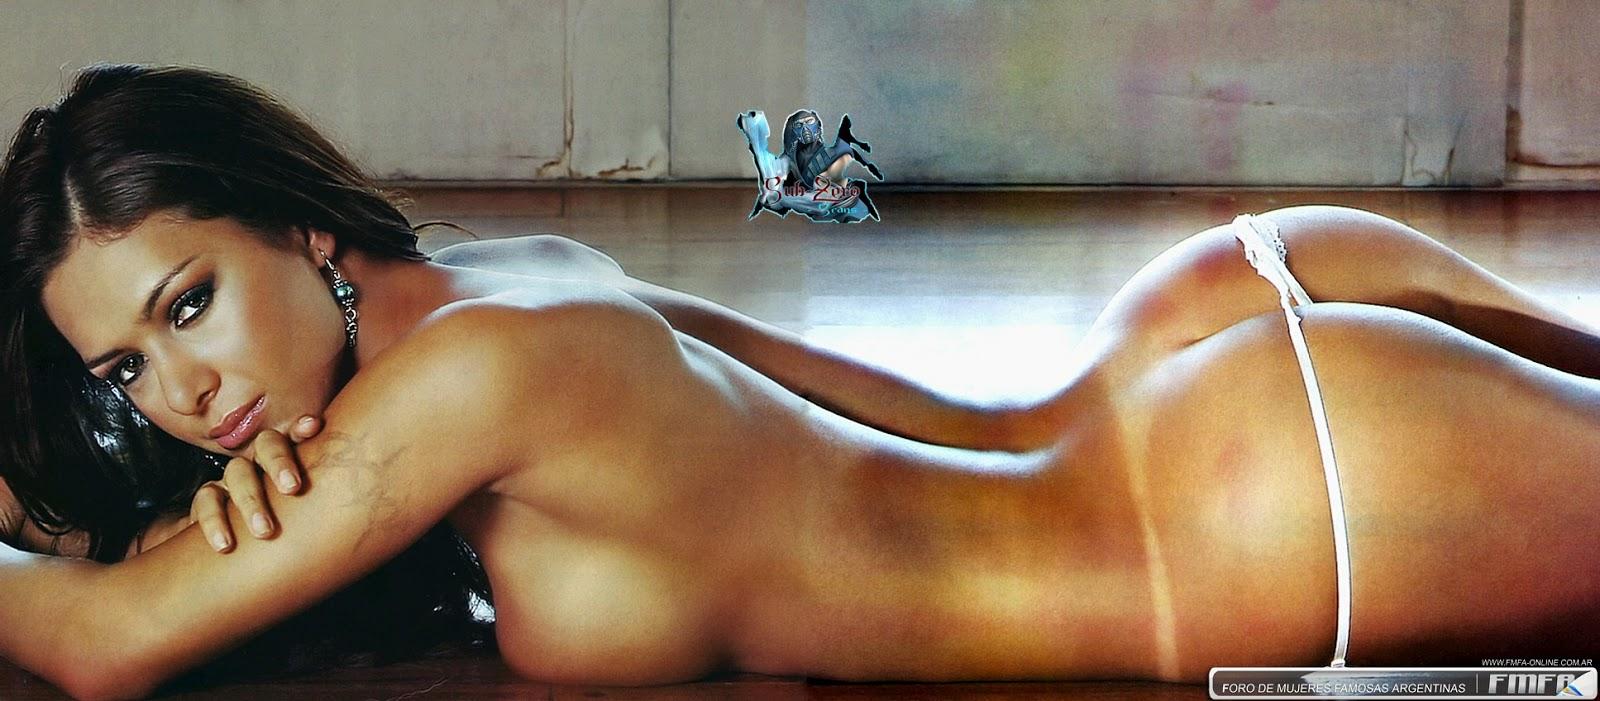 Rocio nude pics, online free lesbian hardcore porn